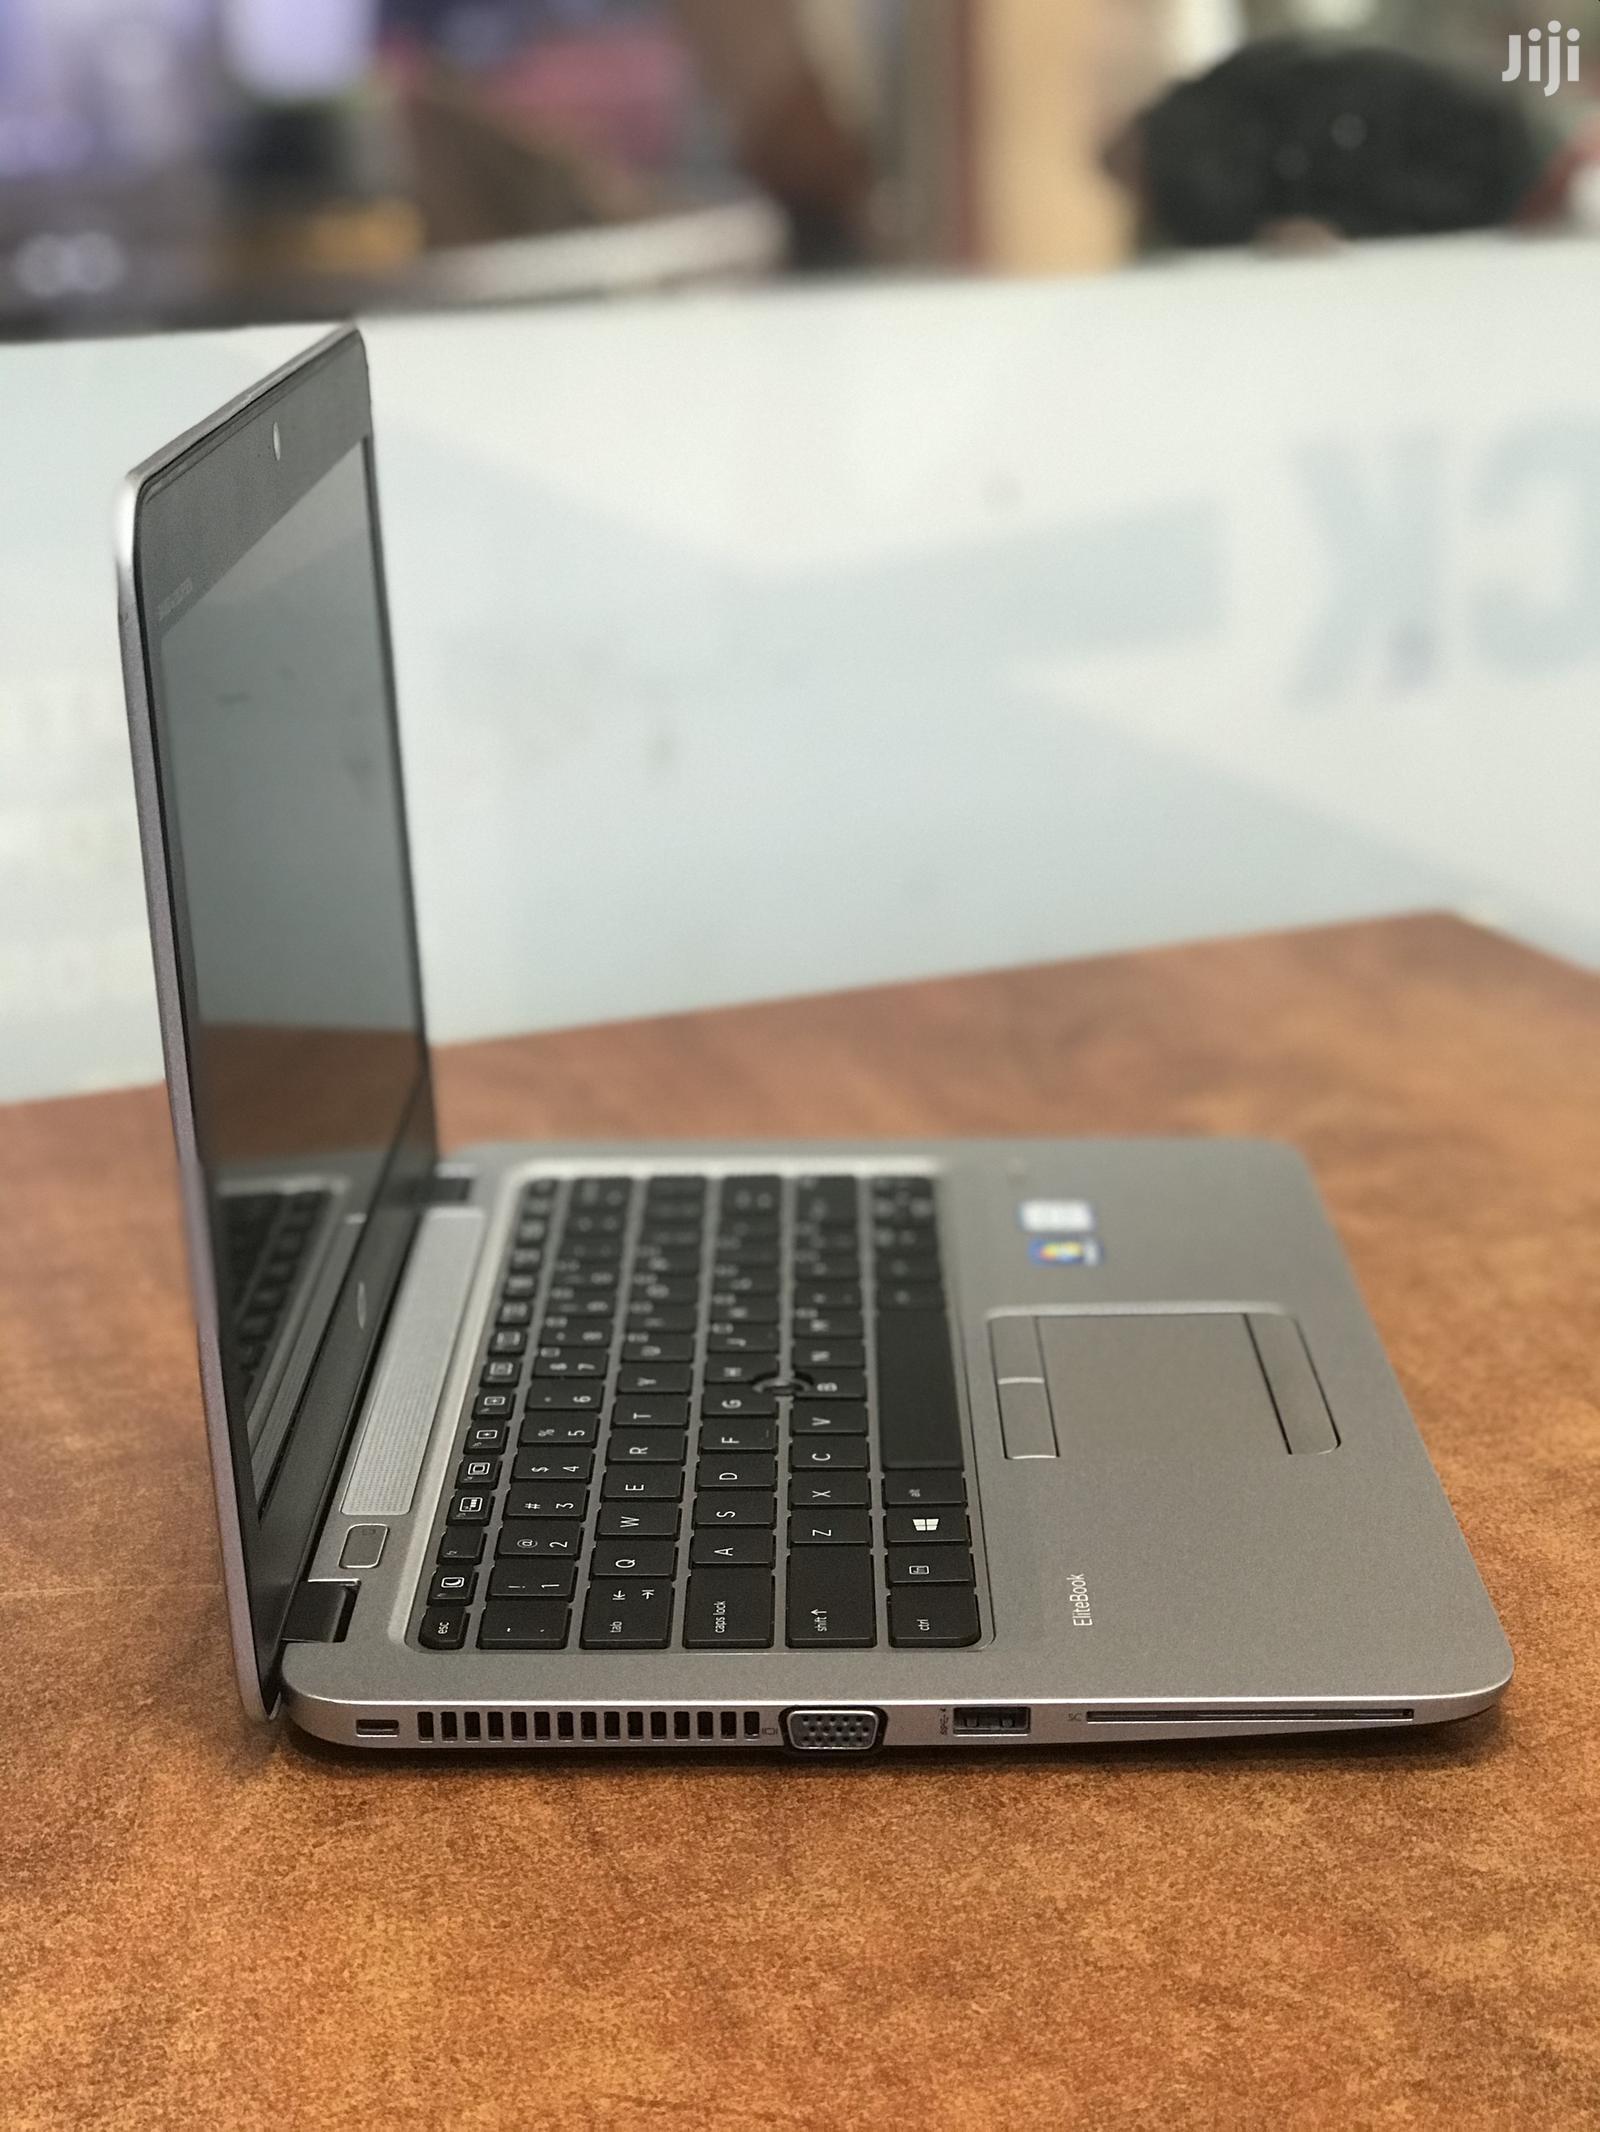 New Laptop HP EliteBook 820 G3 8GB Intel Core I5 HDD 500GB   Laptops & Computers for sale in Kampala, Central Region, Uganda